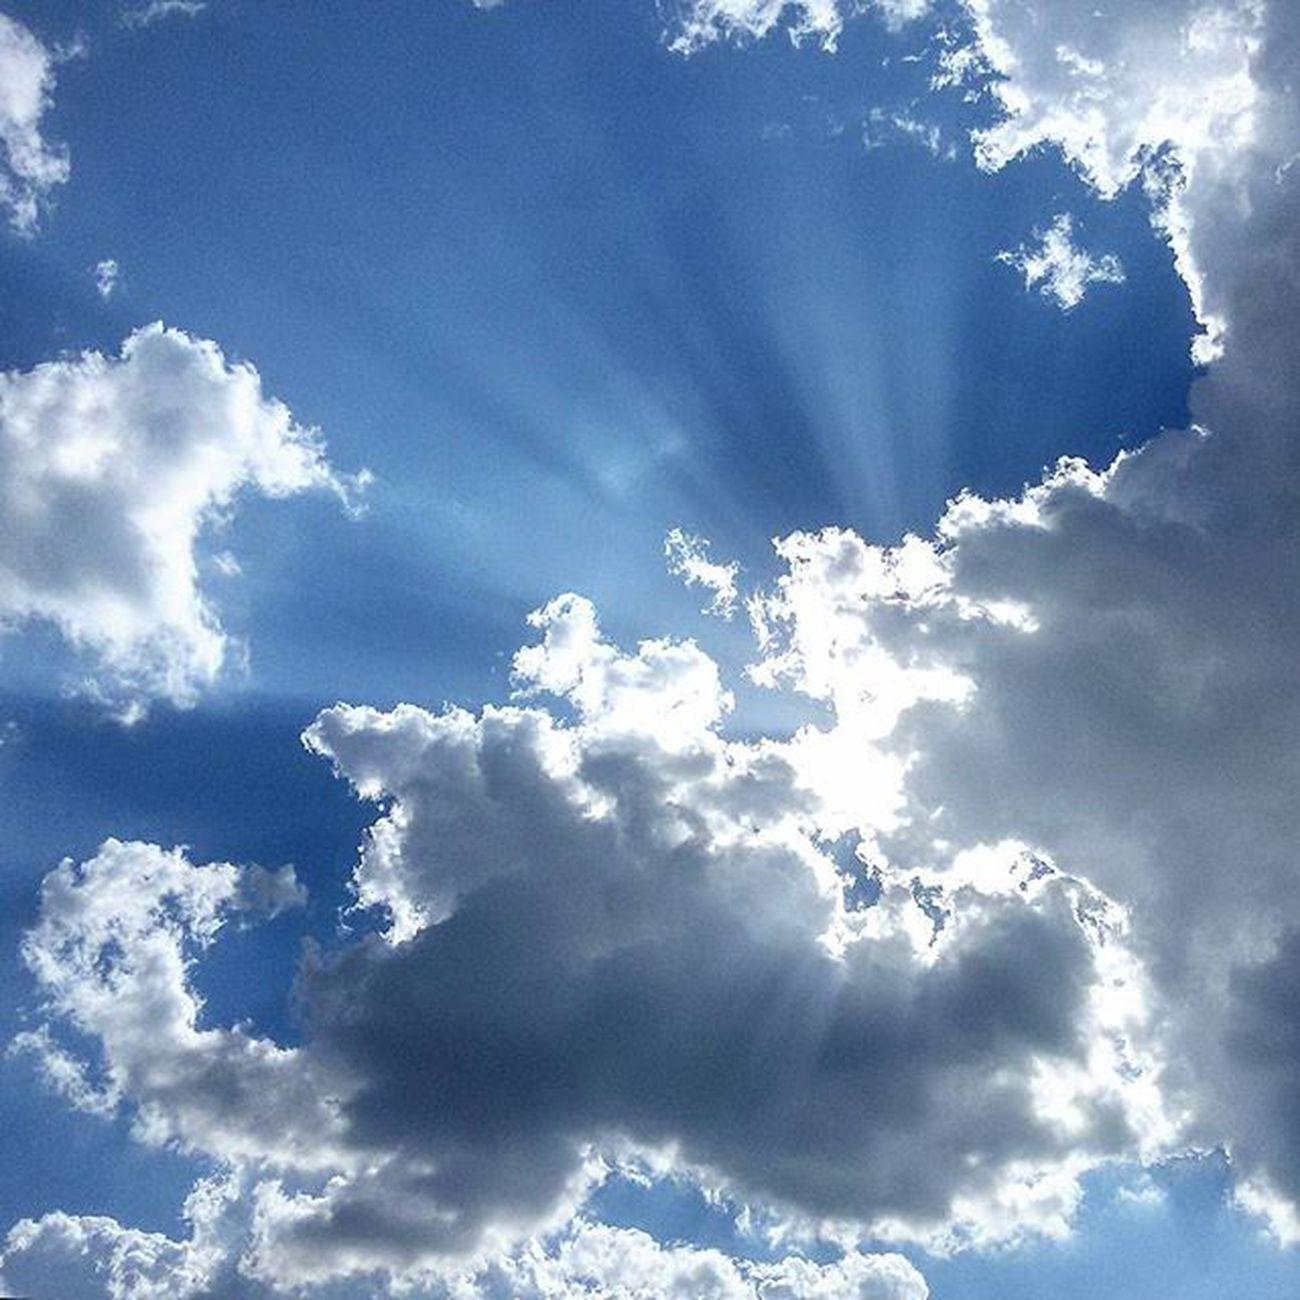 Sky Skyporn Summer Summertime Summer2015 Blue Cloudporn Cloud Cielo Nuvole Myvallo Igersitalia Igersoftheday Igerscampania Igers_salerno Vallodidiano Chasinglight AlzaLoSguardo @igers_salerno